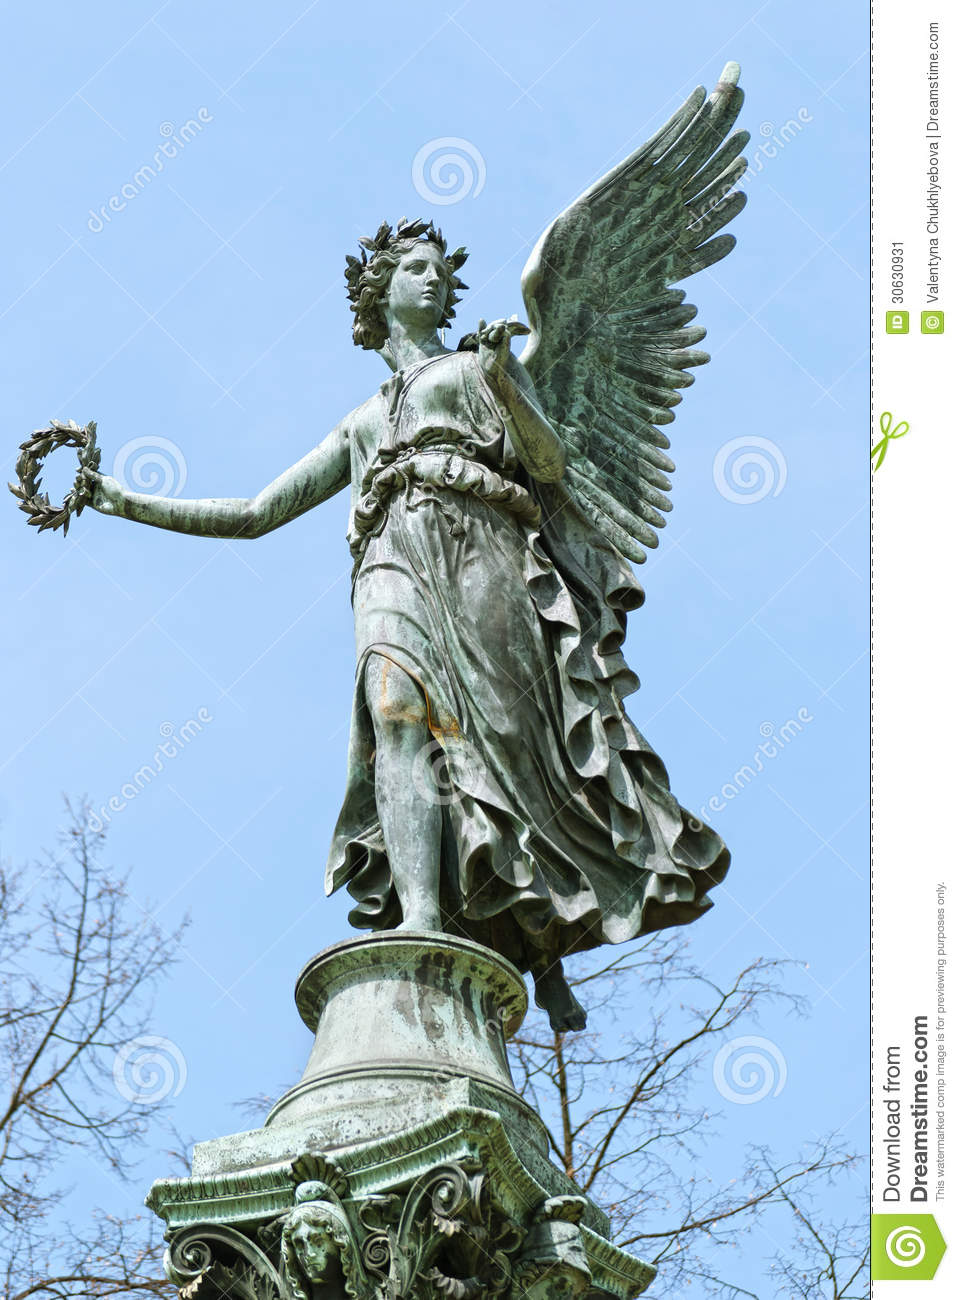 statue od angel charlottenburg palace garden berlin